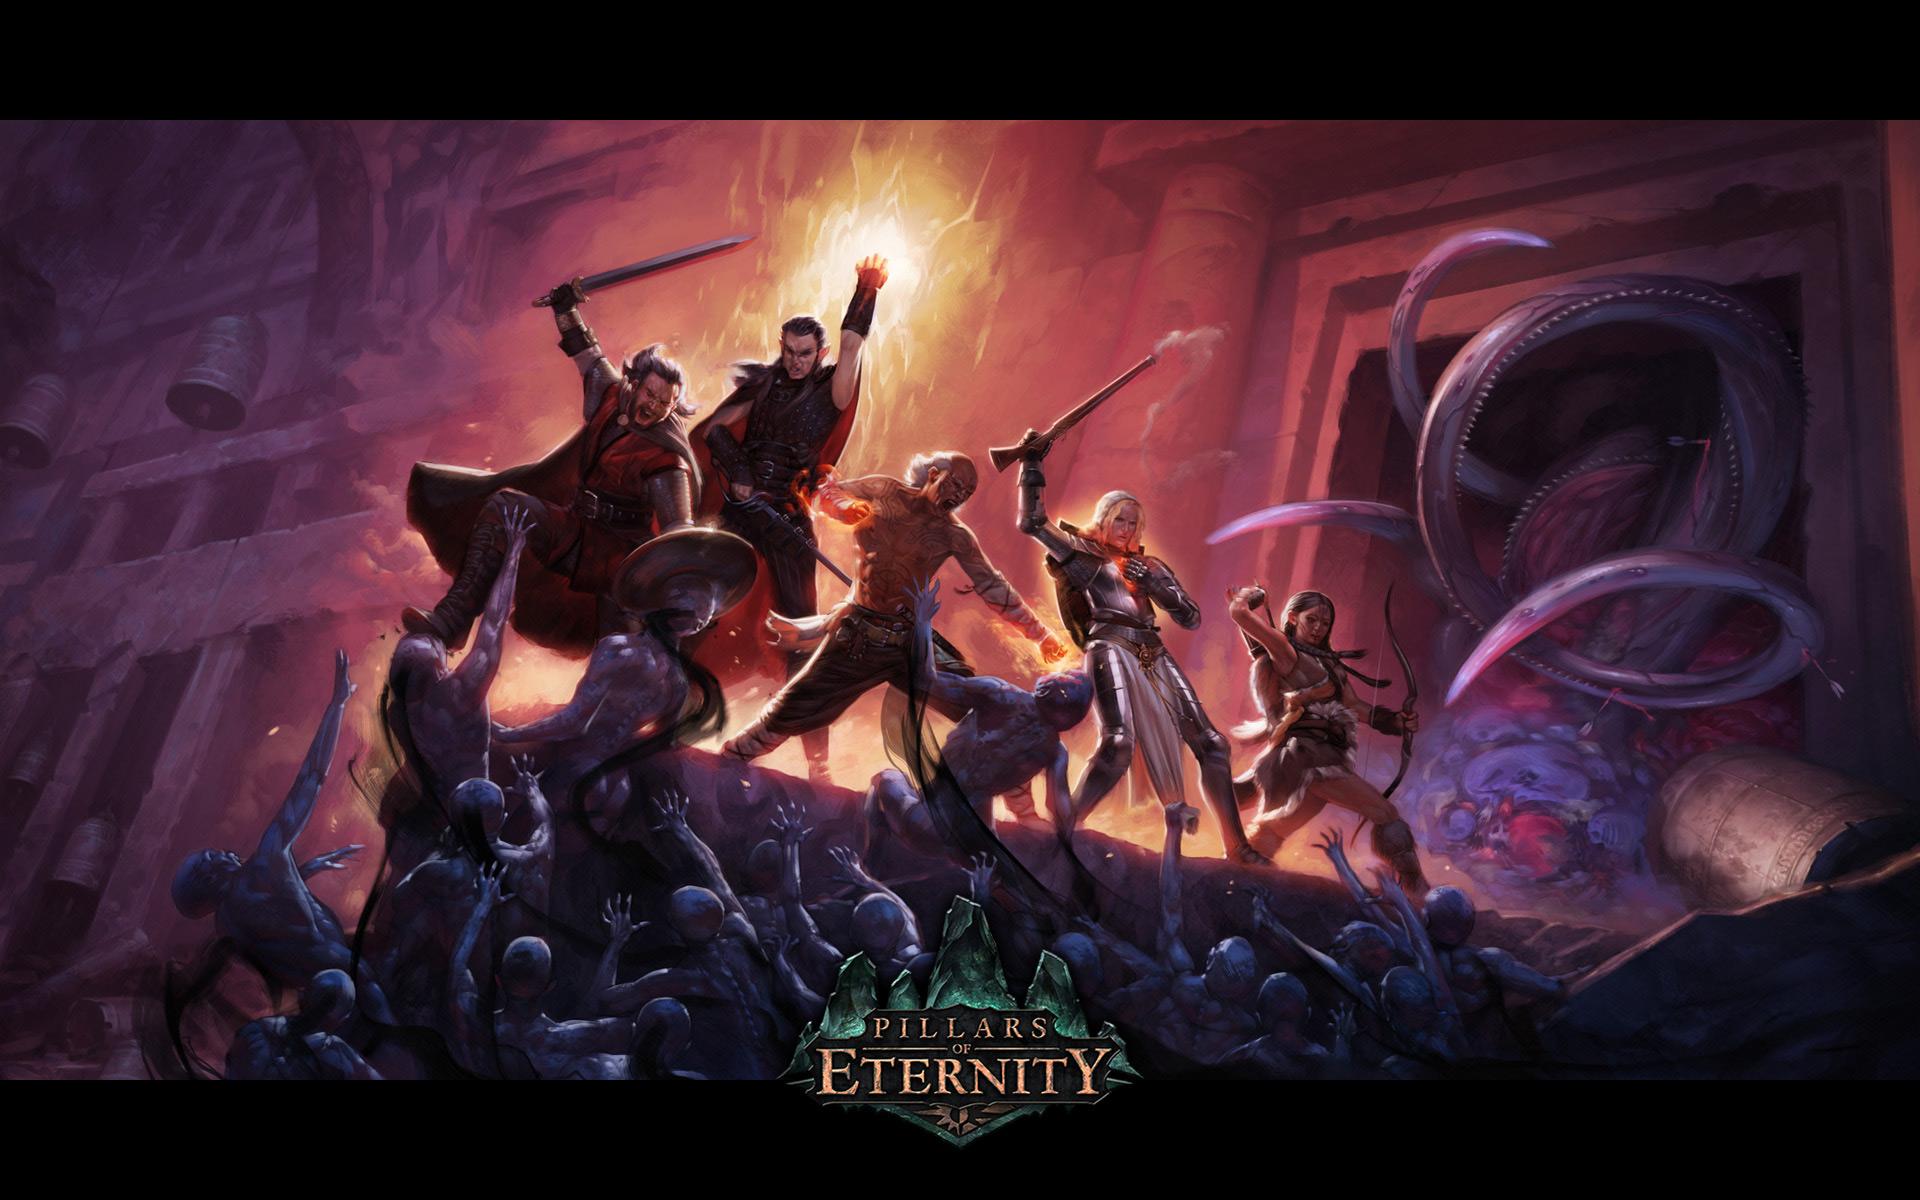 Pillars of Eternity wymagania